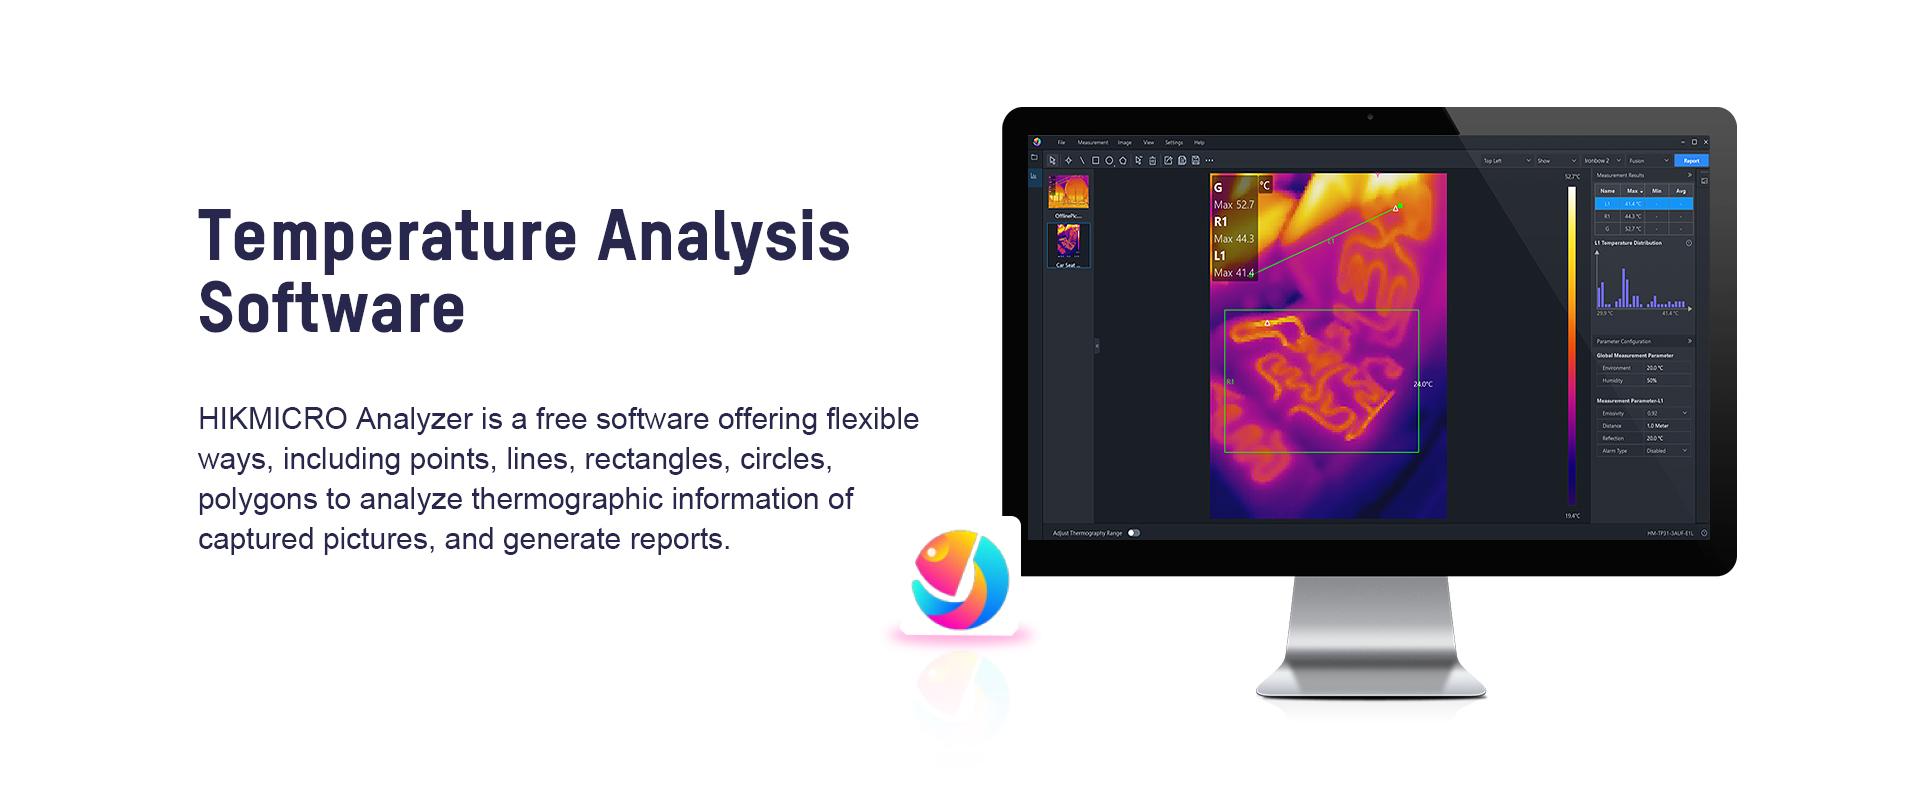 02-Temperature analysis software (Update).jpg